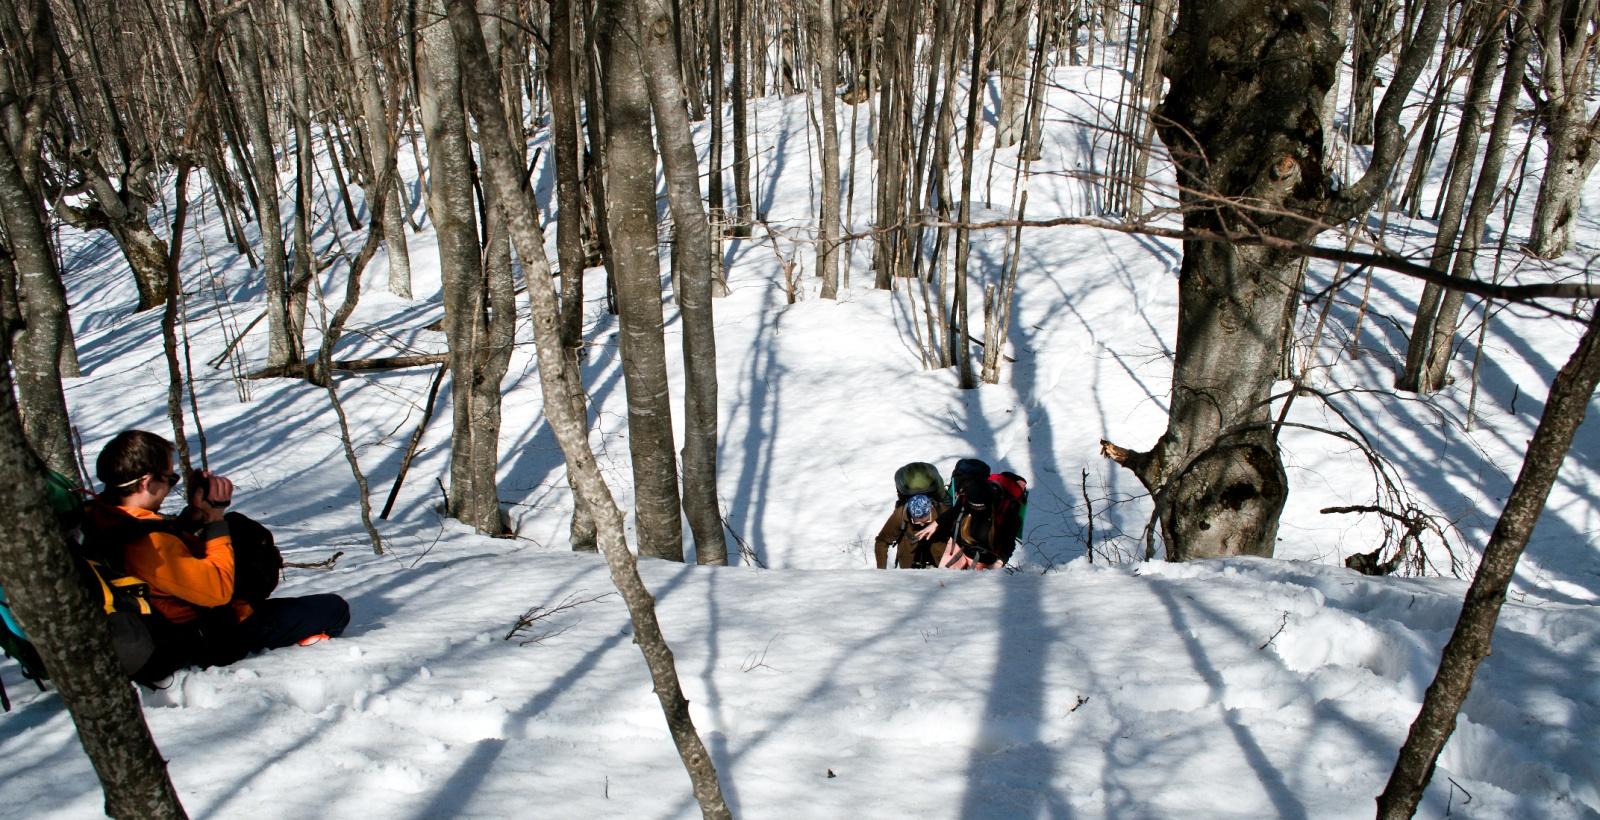 Описание: 24-26 марта 2012 (Большой каньон)\_DSC0093-Edit.jpg